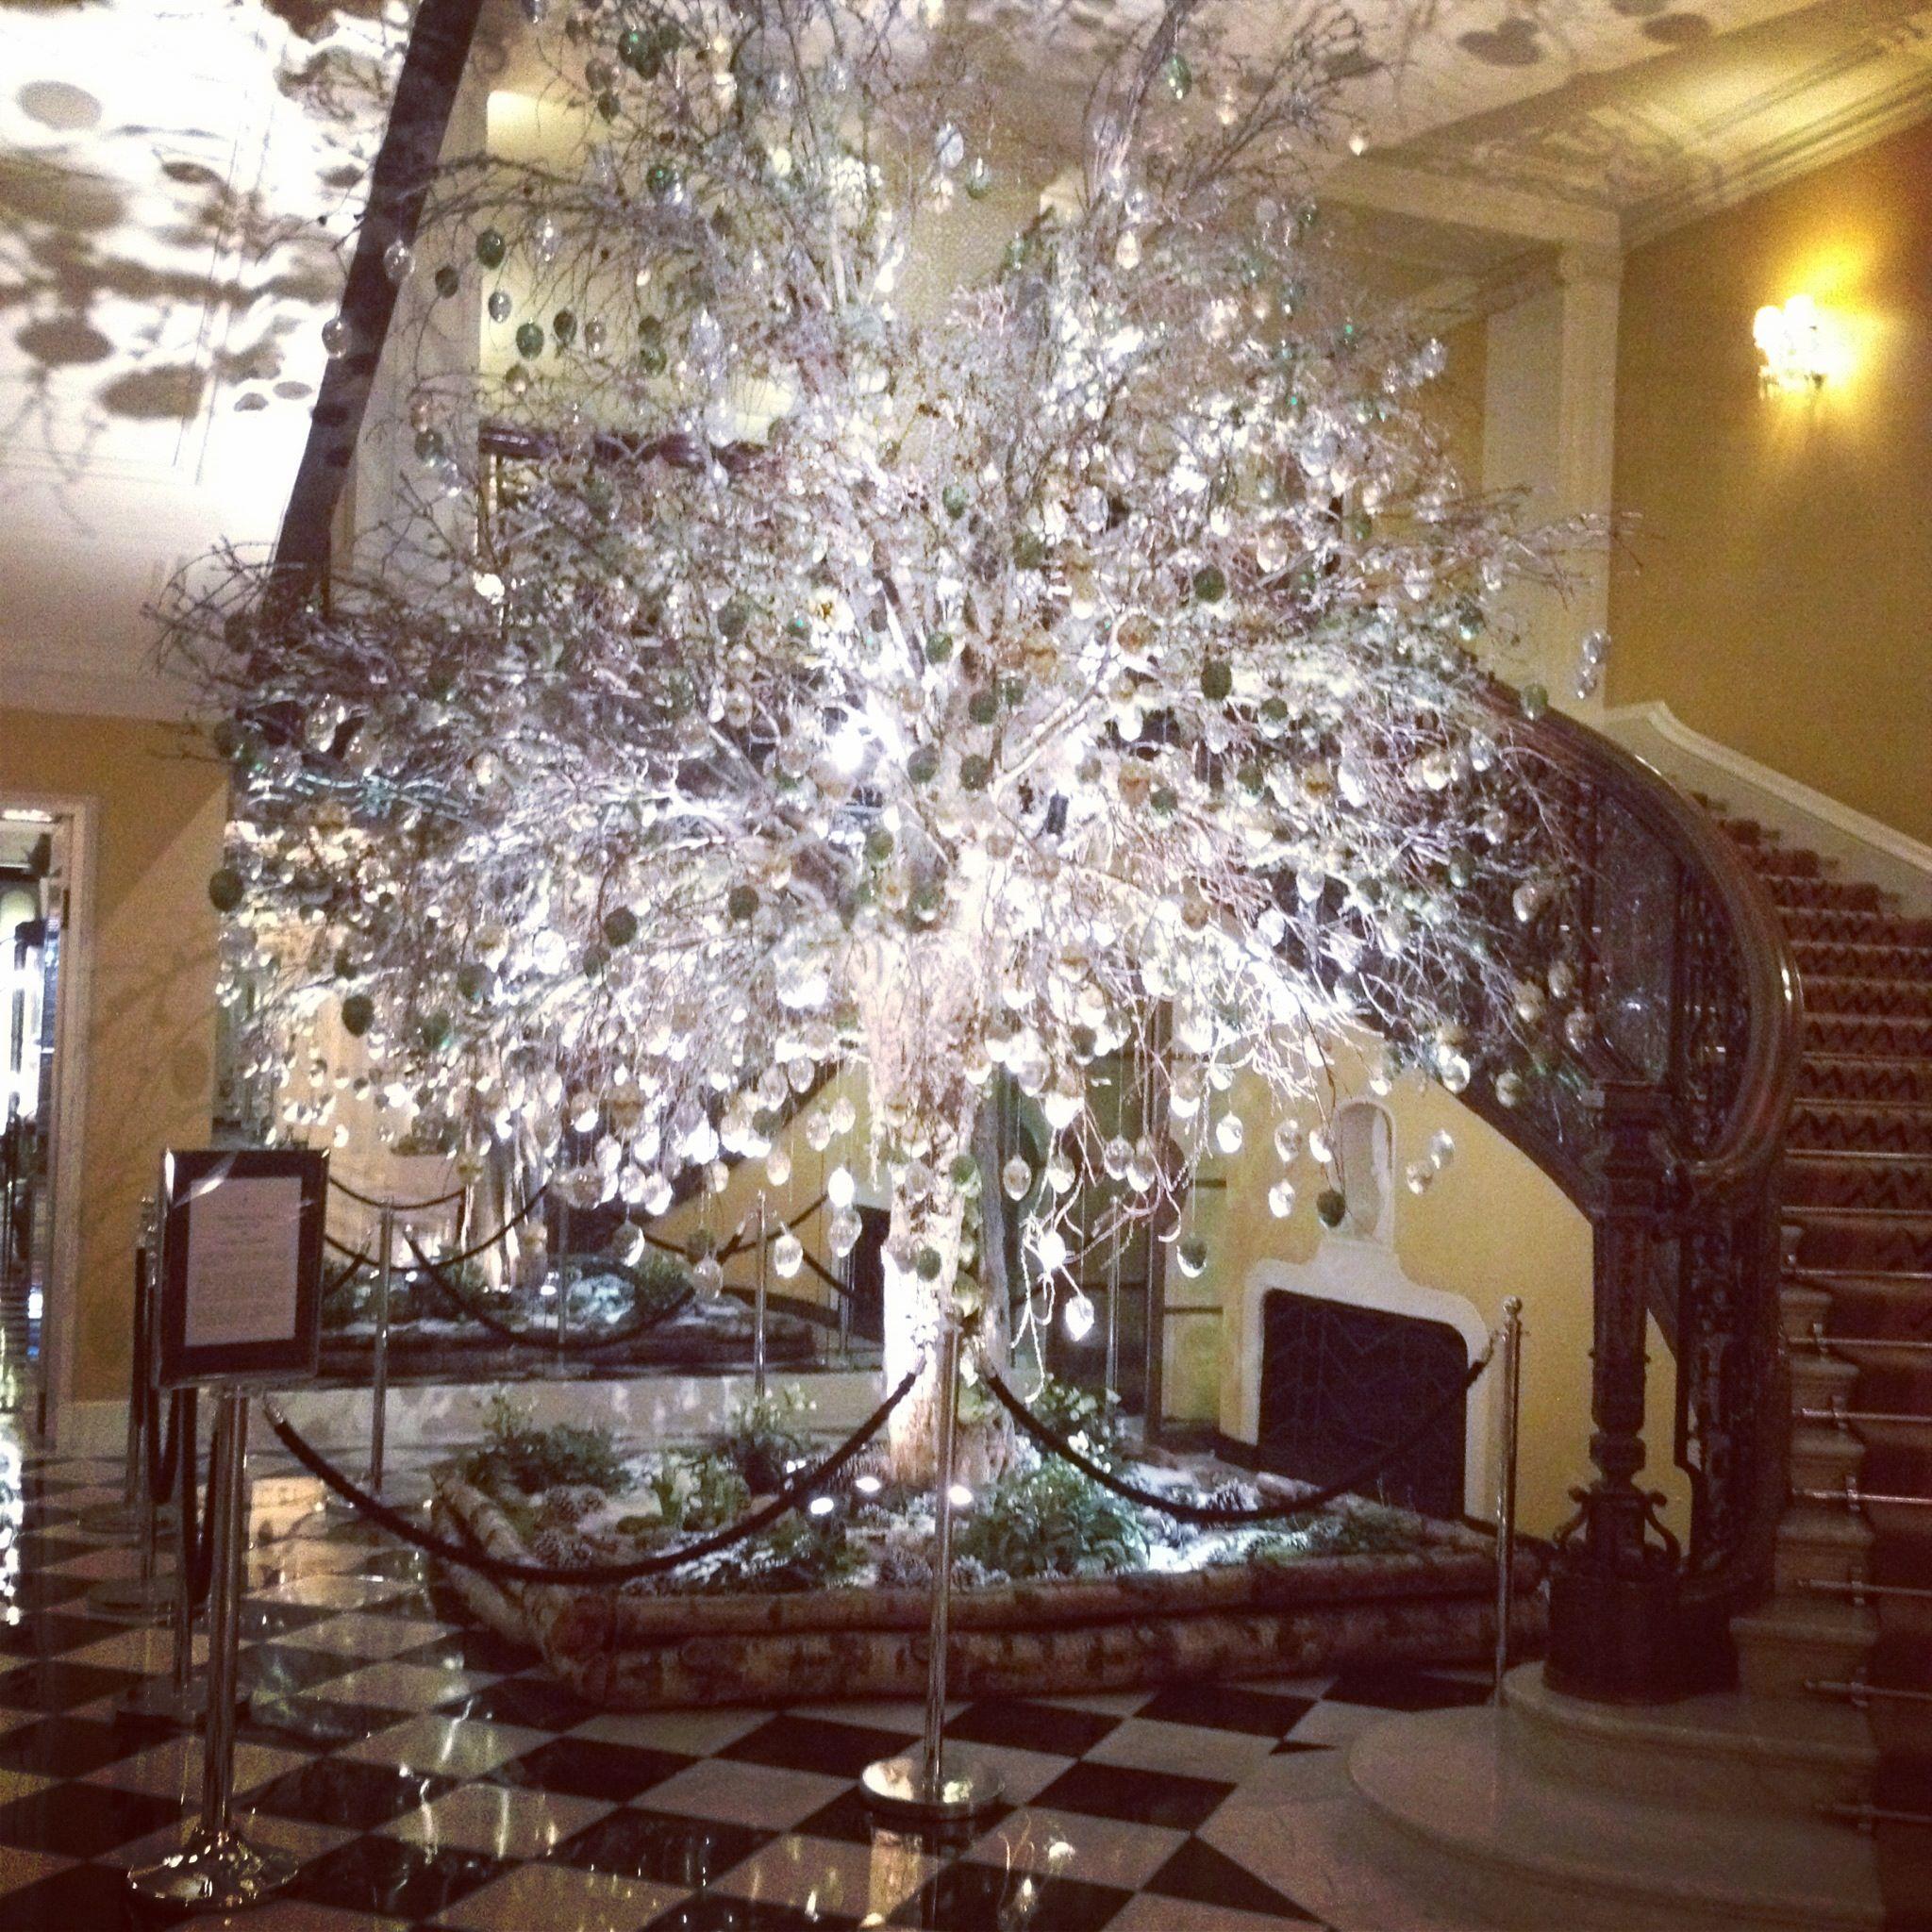 Claridges hotel 2012 christmas tree designed by kally for Hotel decor 2017